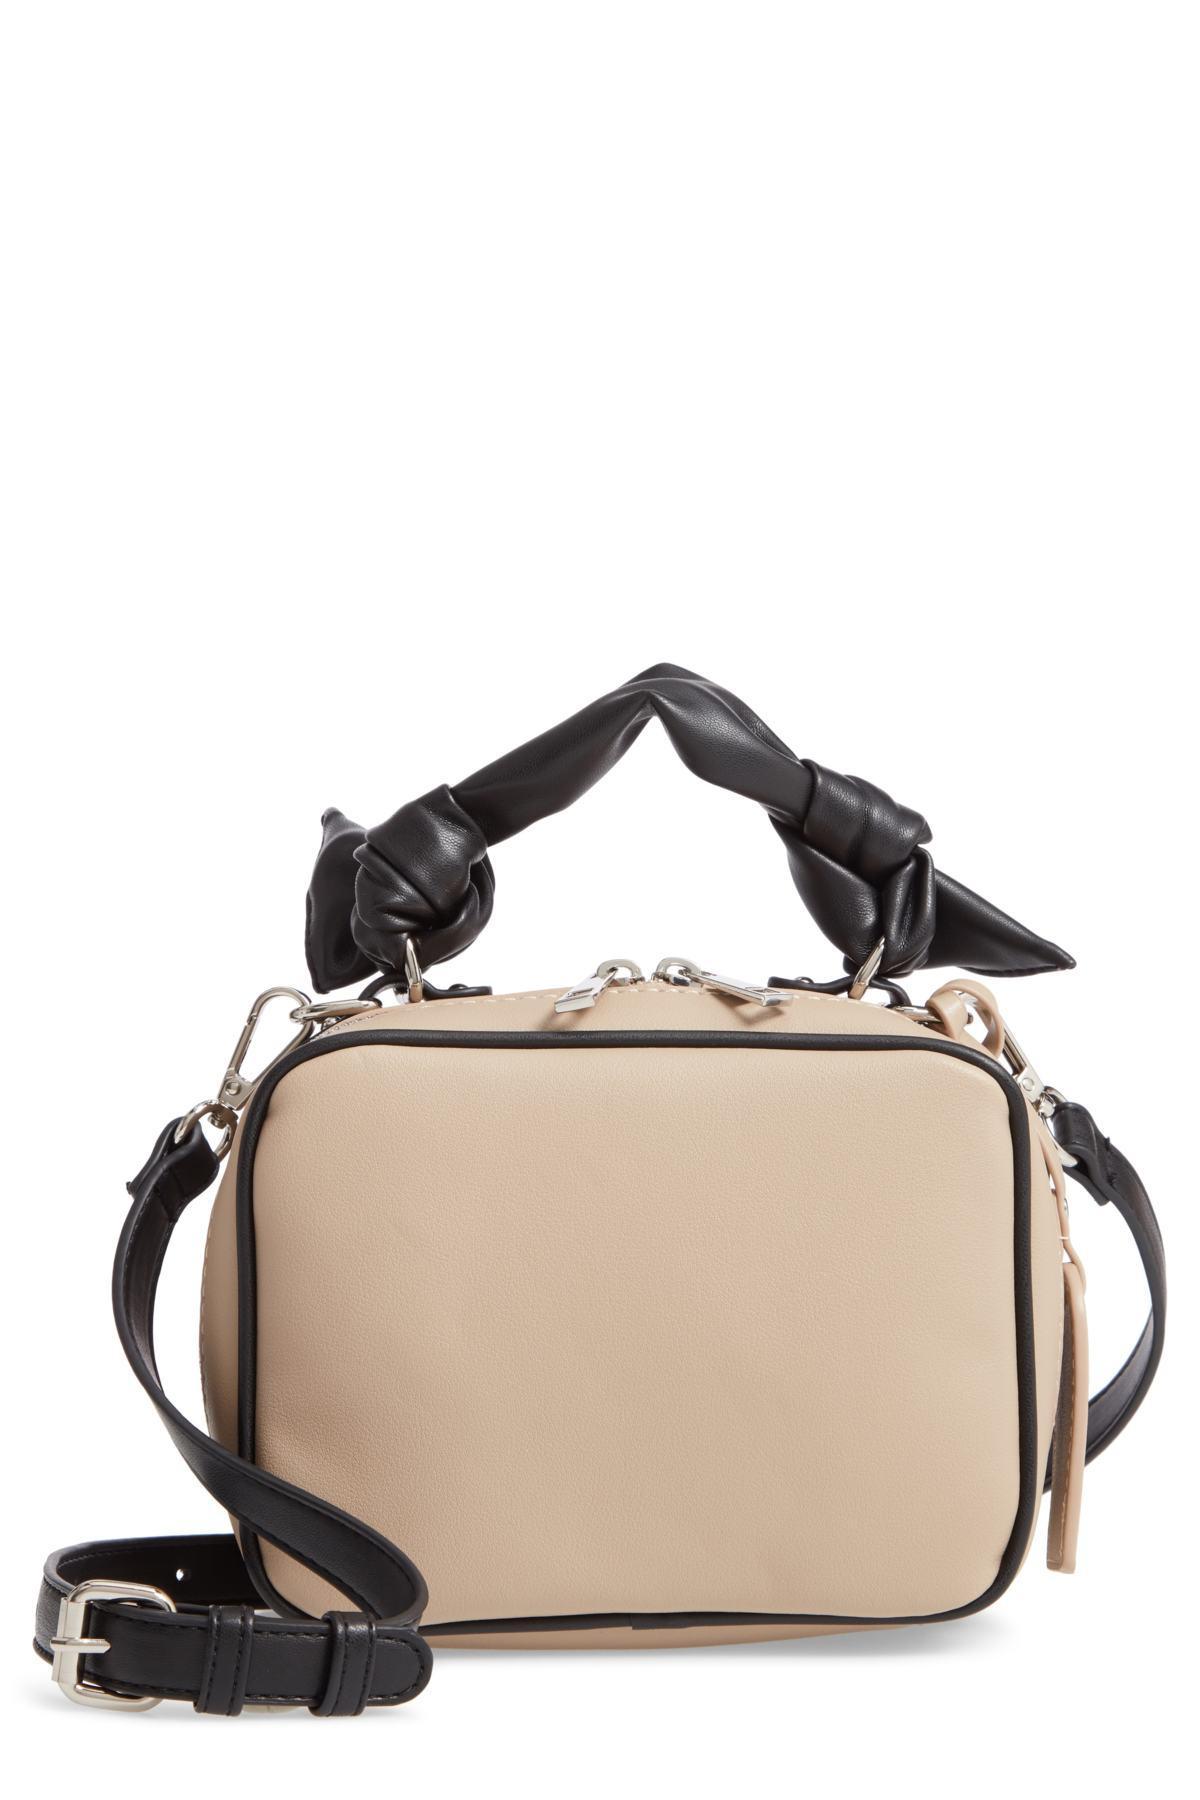 359e789fb7 Lyst - Sole Society Douga Faux Leather Crossbody Camera Bag in Black